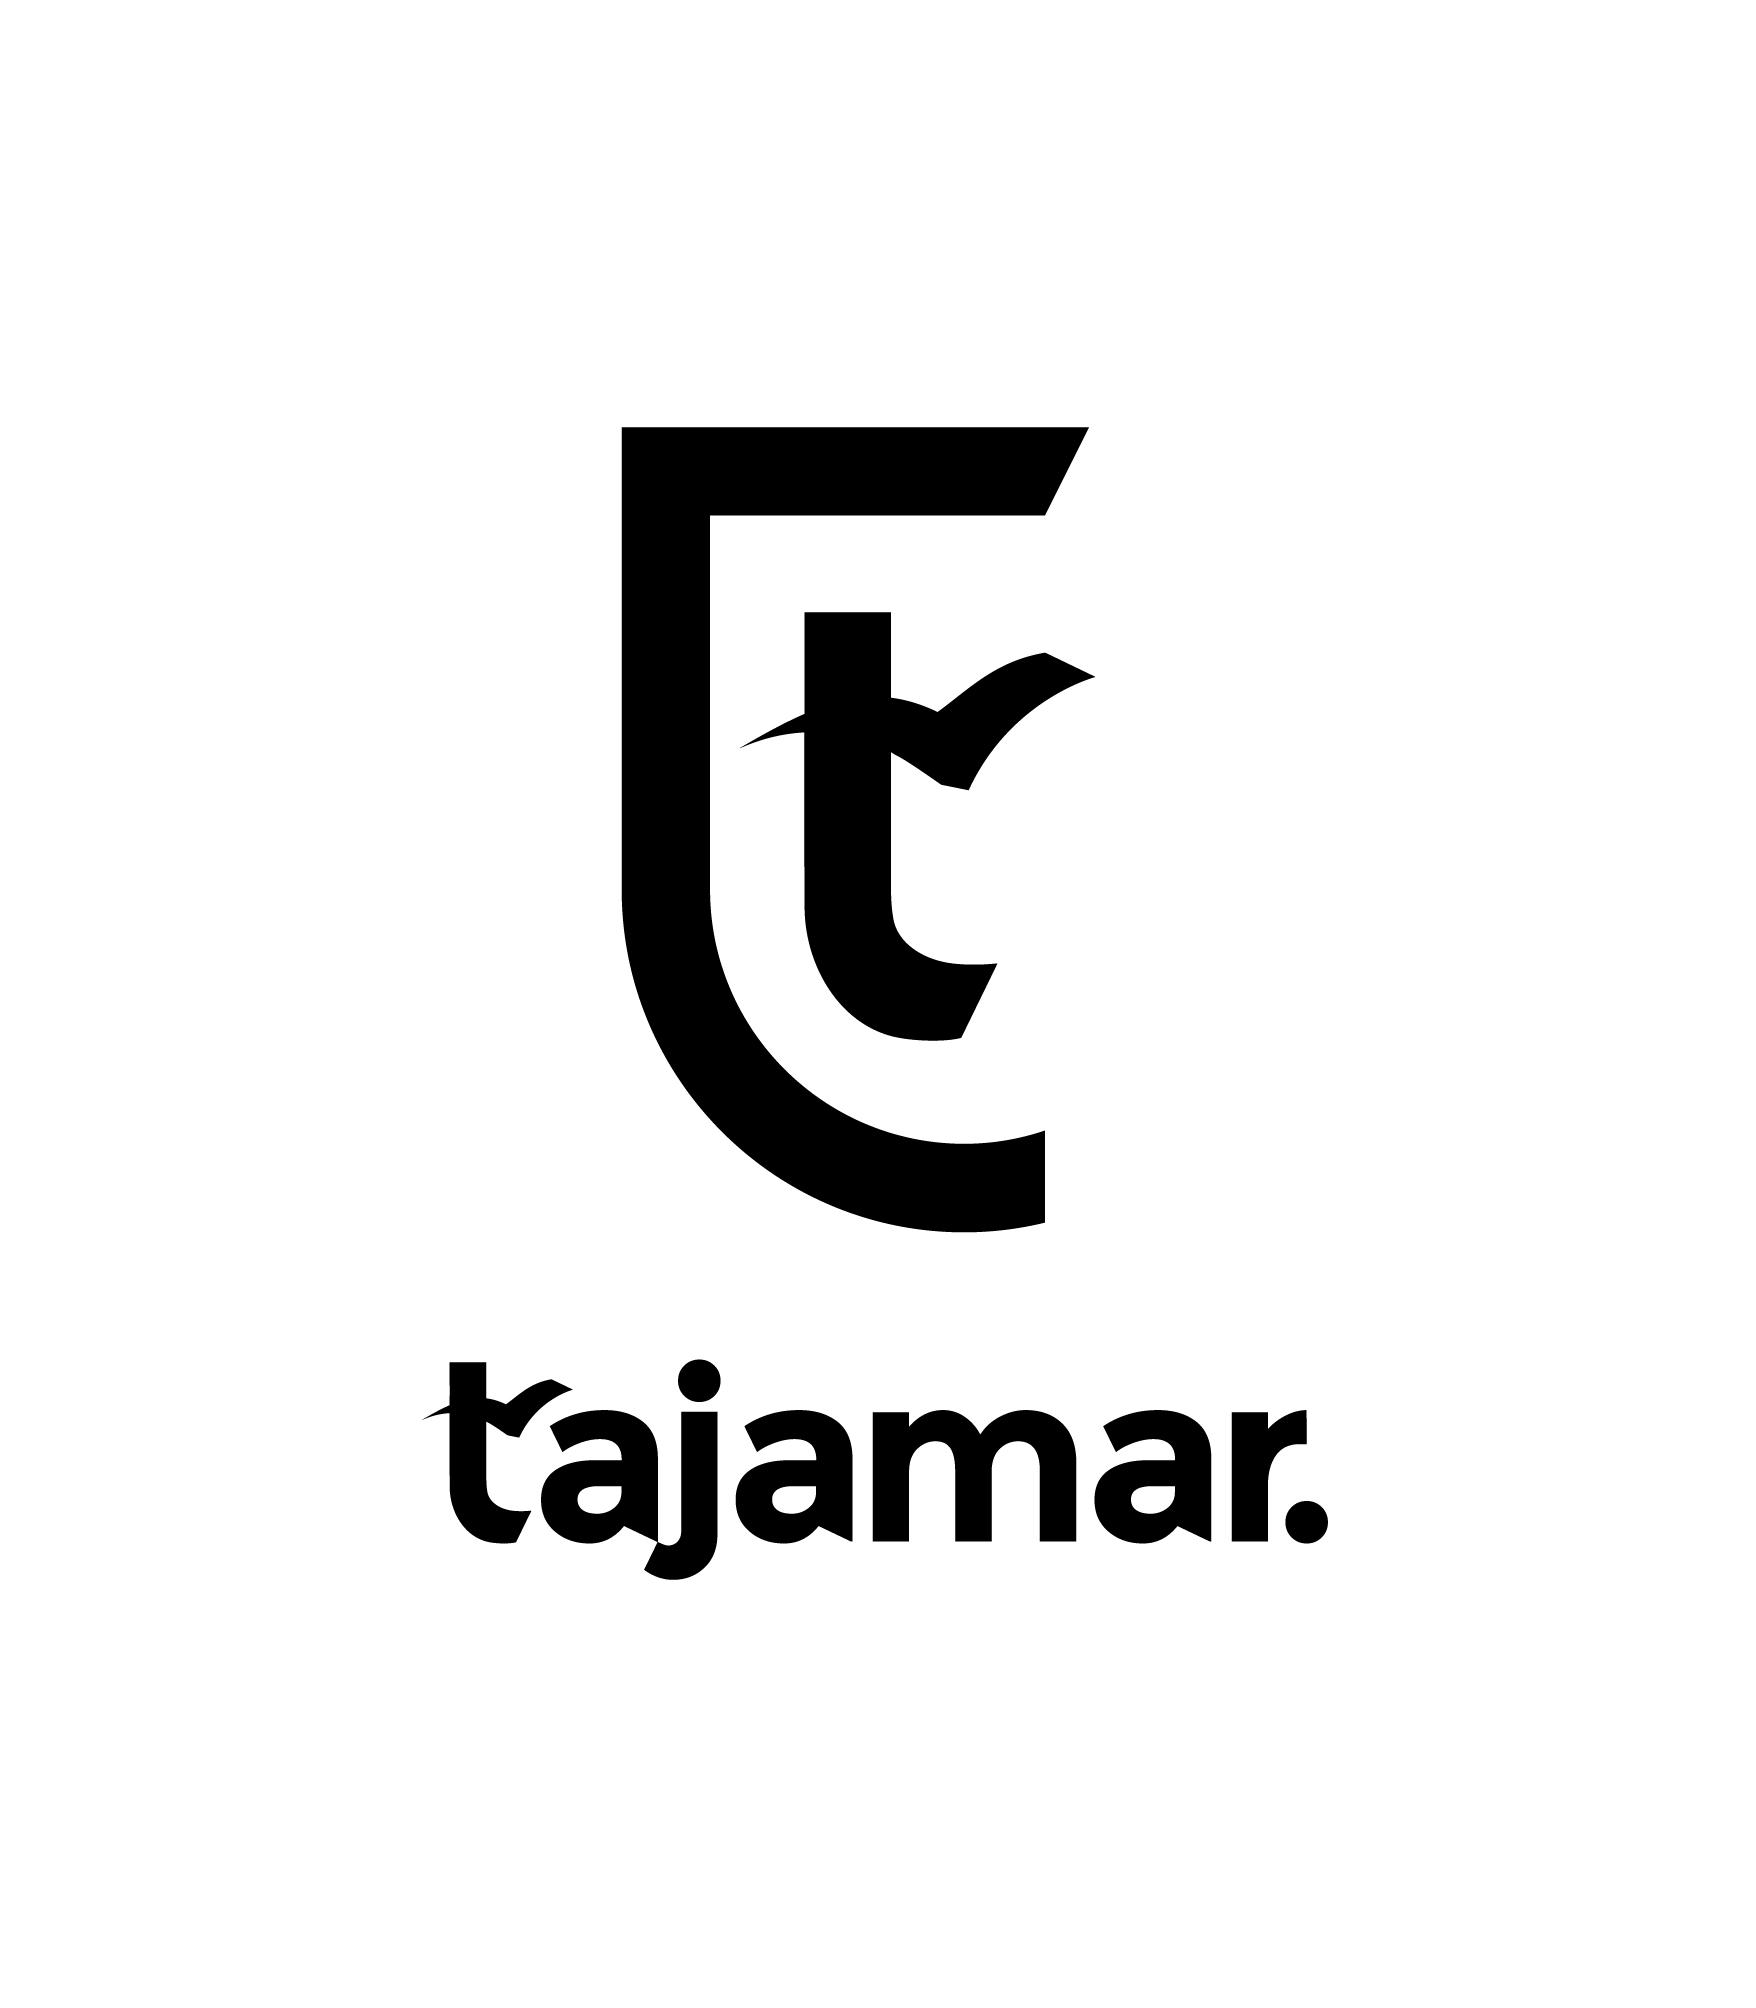 CLUB DEPORTIVO TAJAMAR